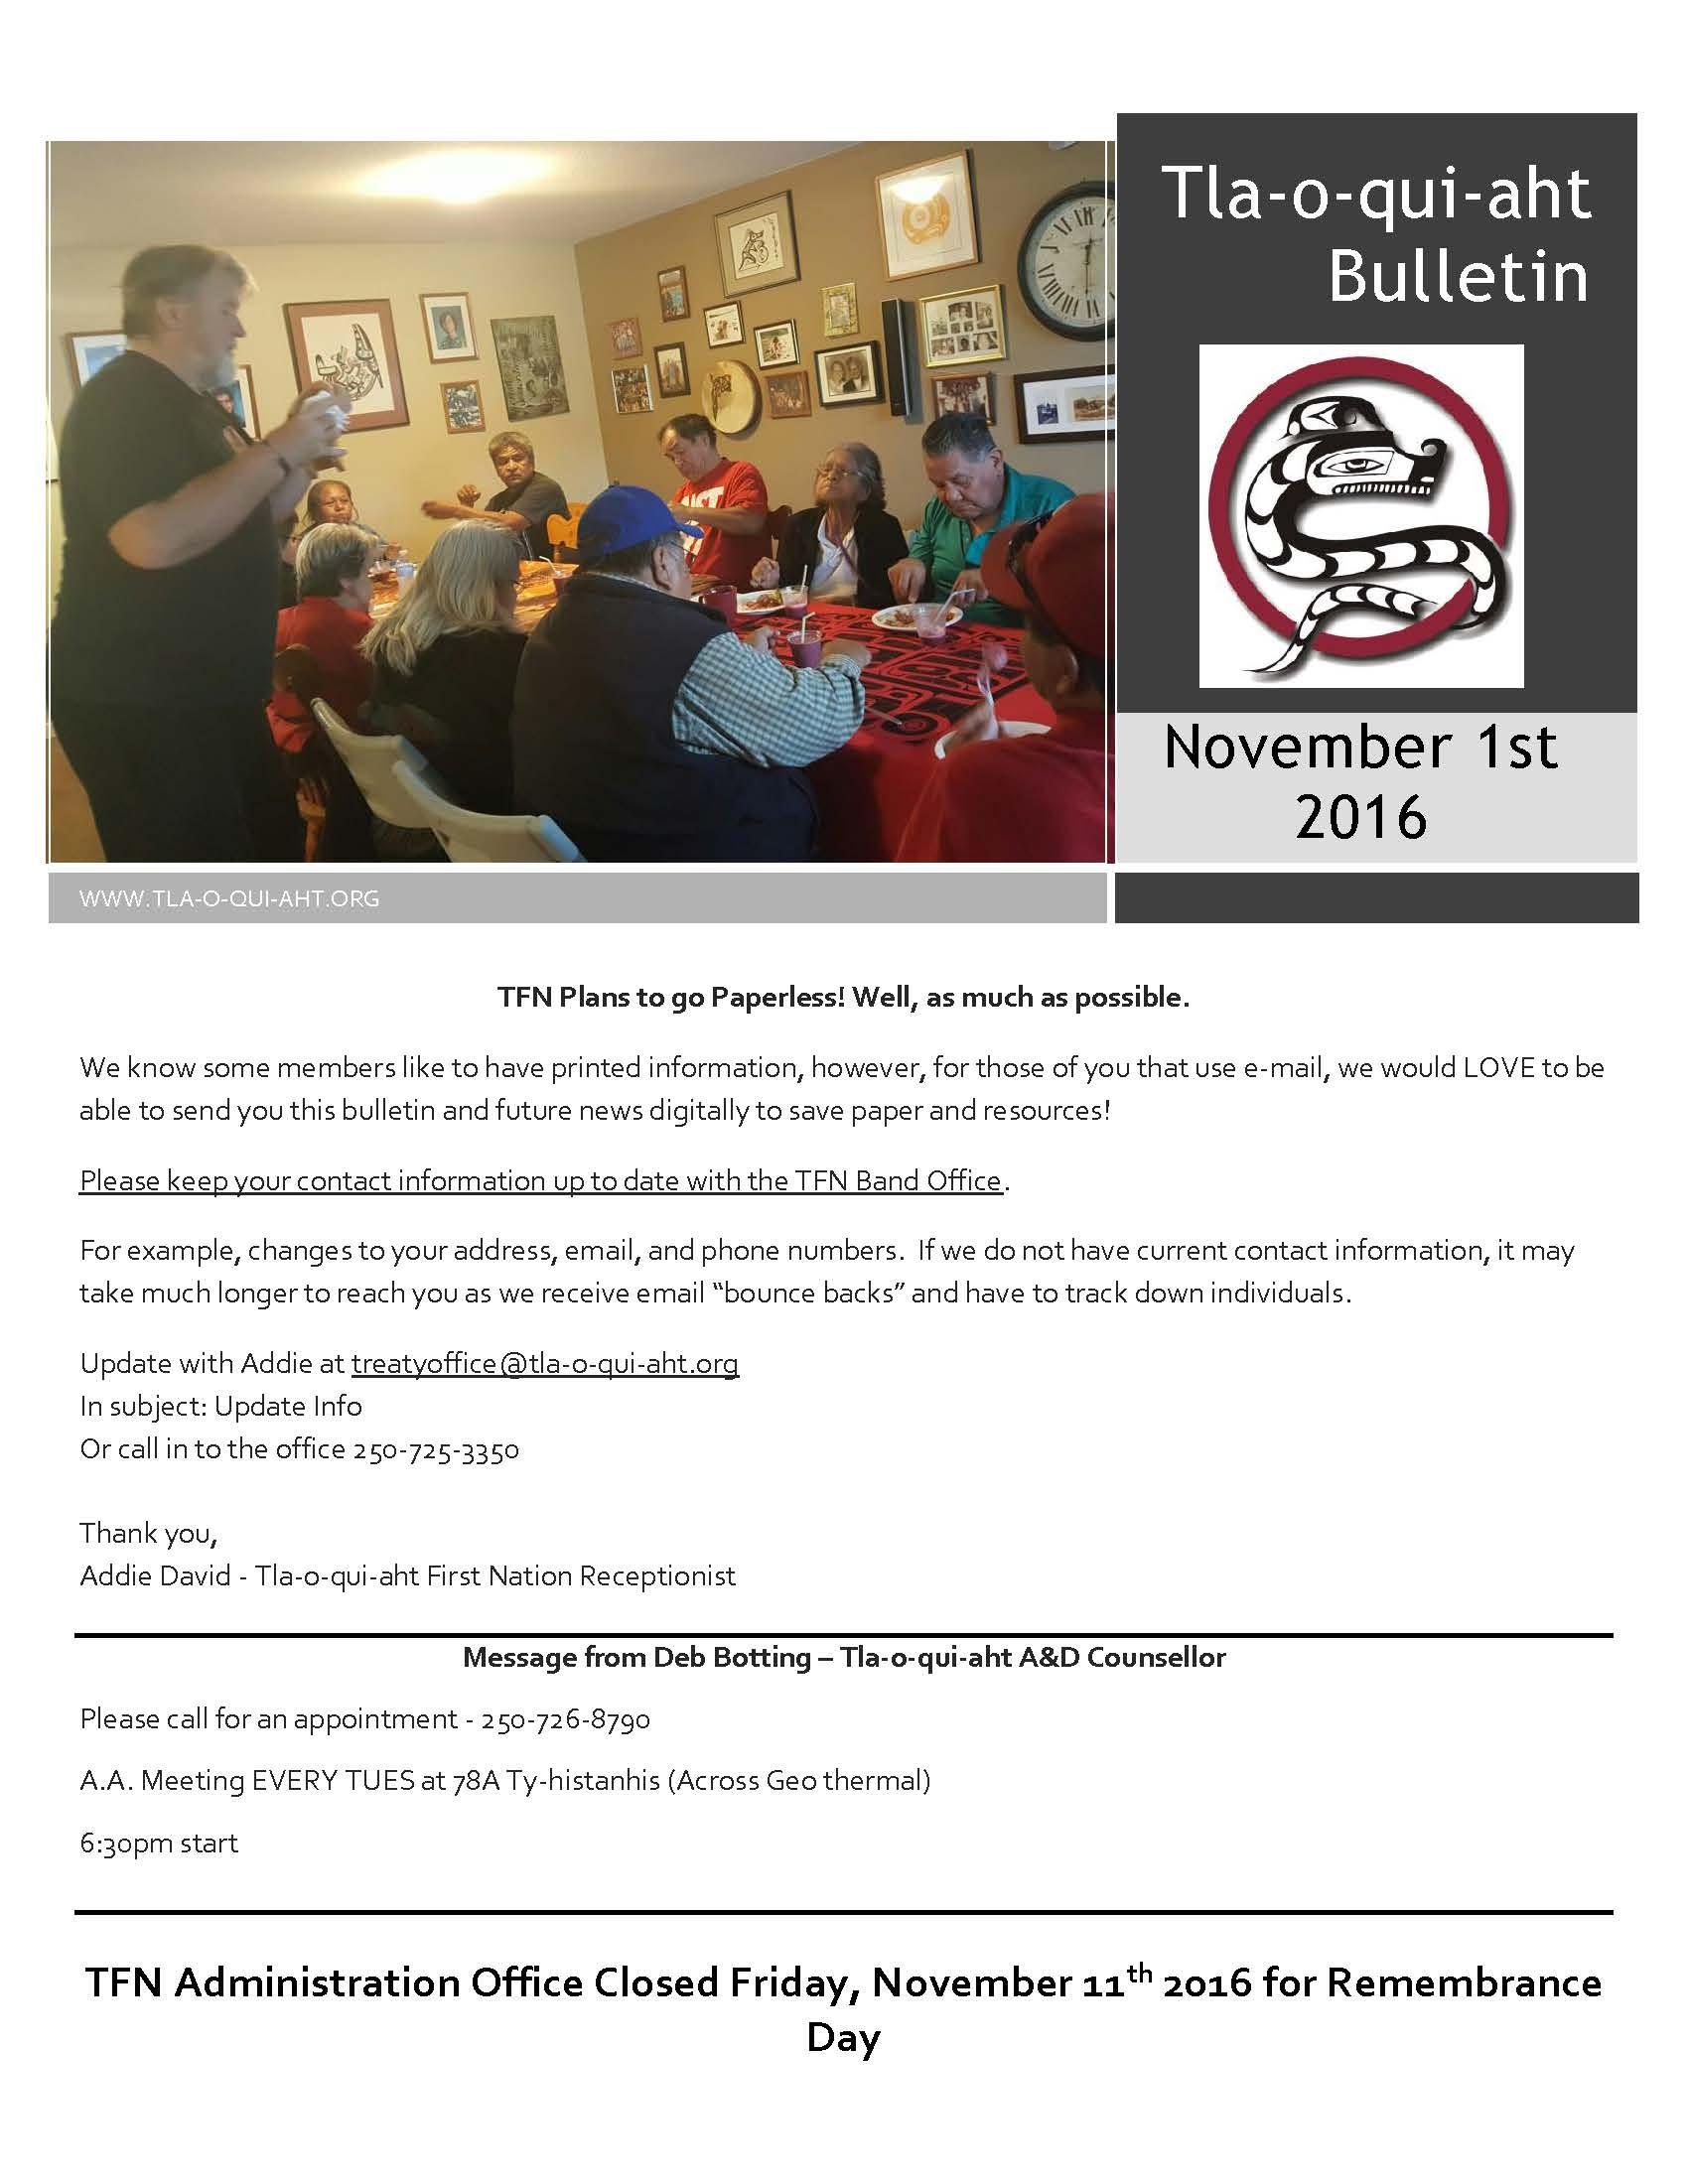 TFN Bulletin Nov 1st 2016_Page_01.jpg